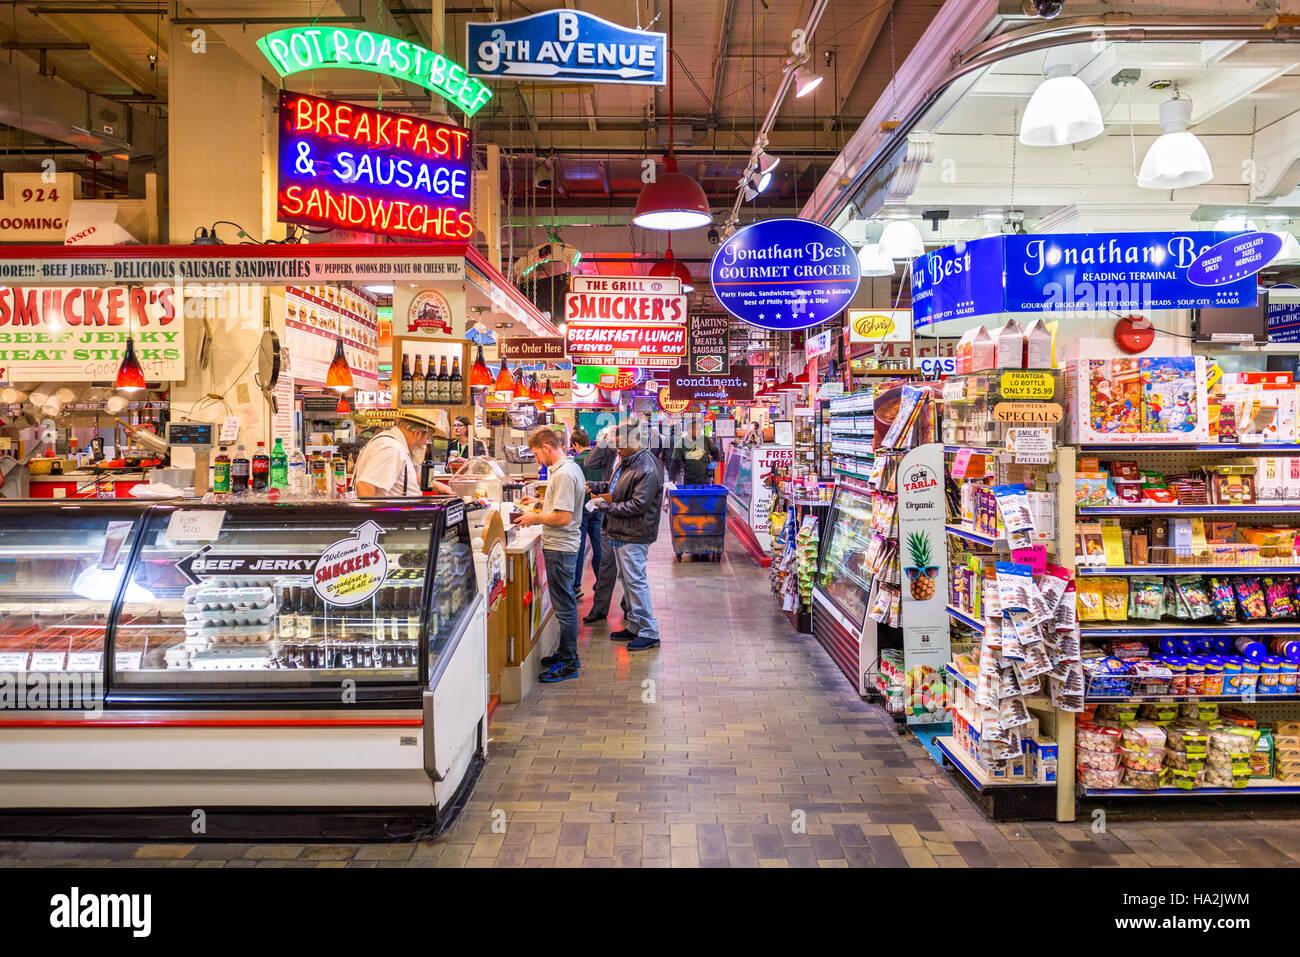 Vendors and customers in Reading Terminal Market in Philadelphia, Pennsylvania, USA. - Stock Image